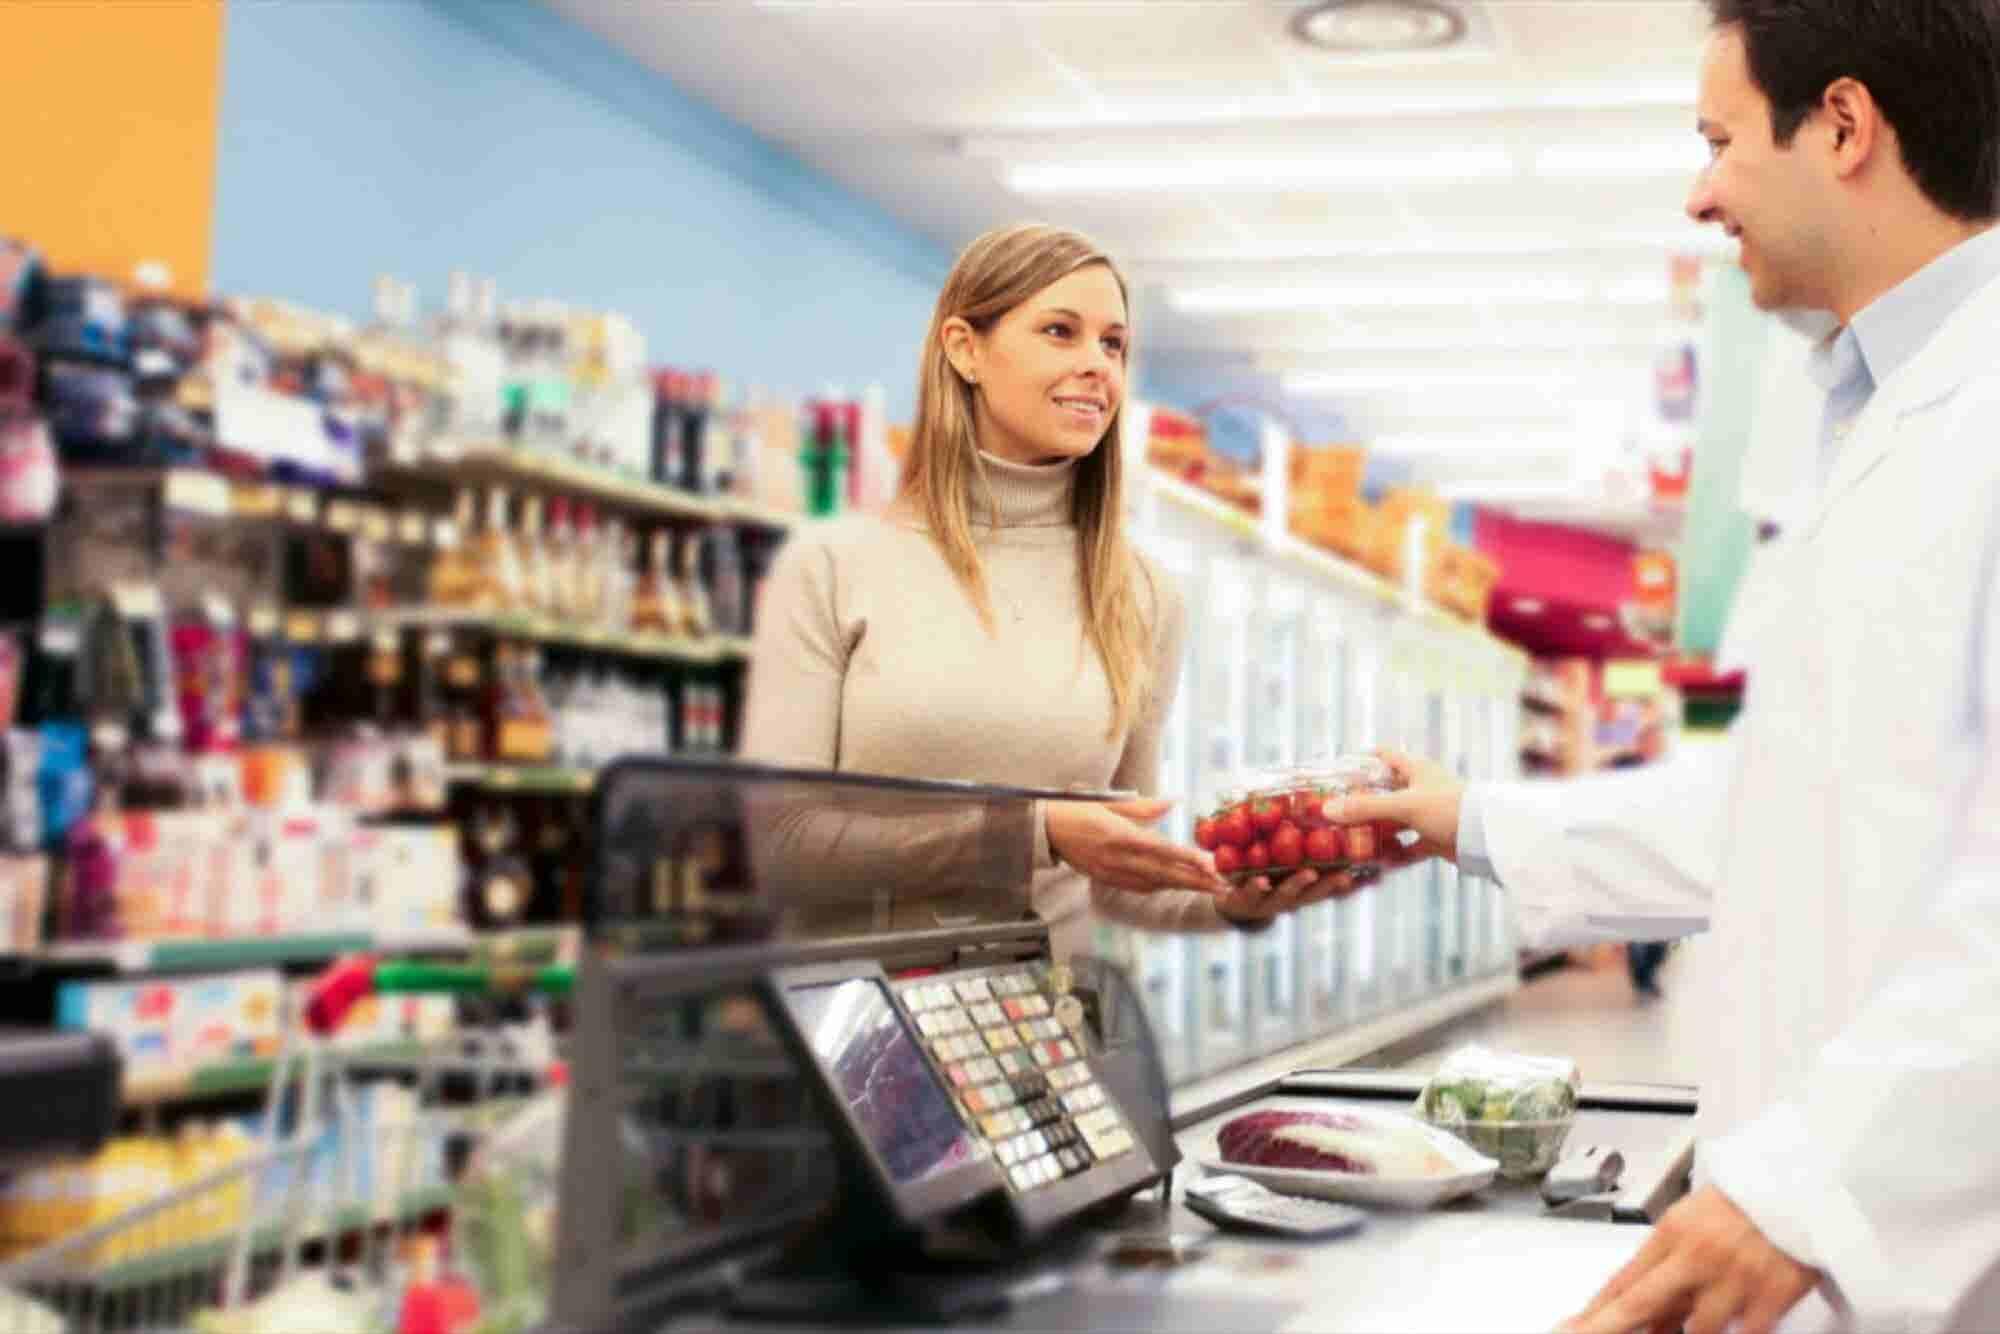 ¿Conoces a tus consumidores? Este dispositivo te ayuda